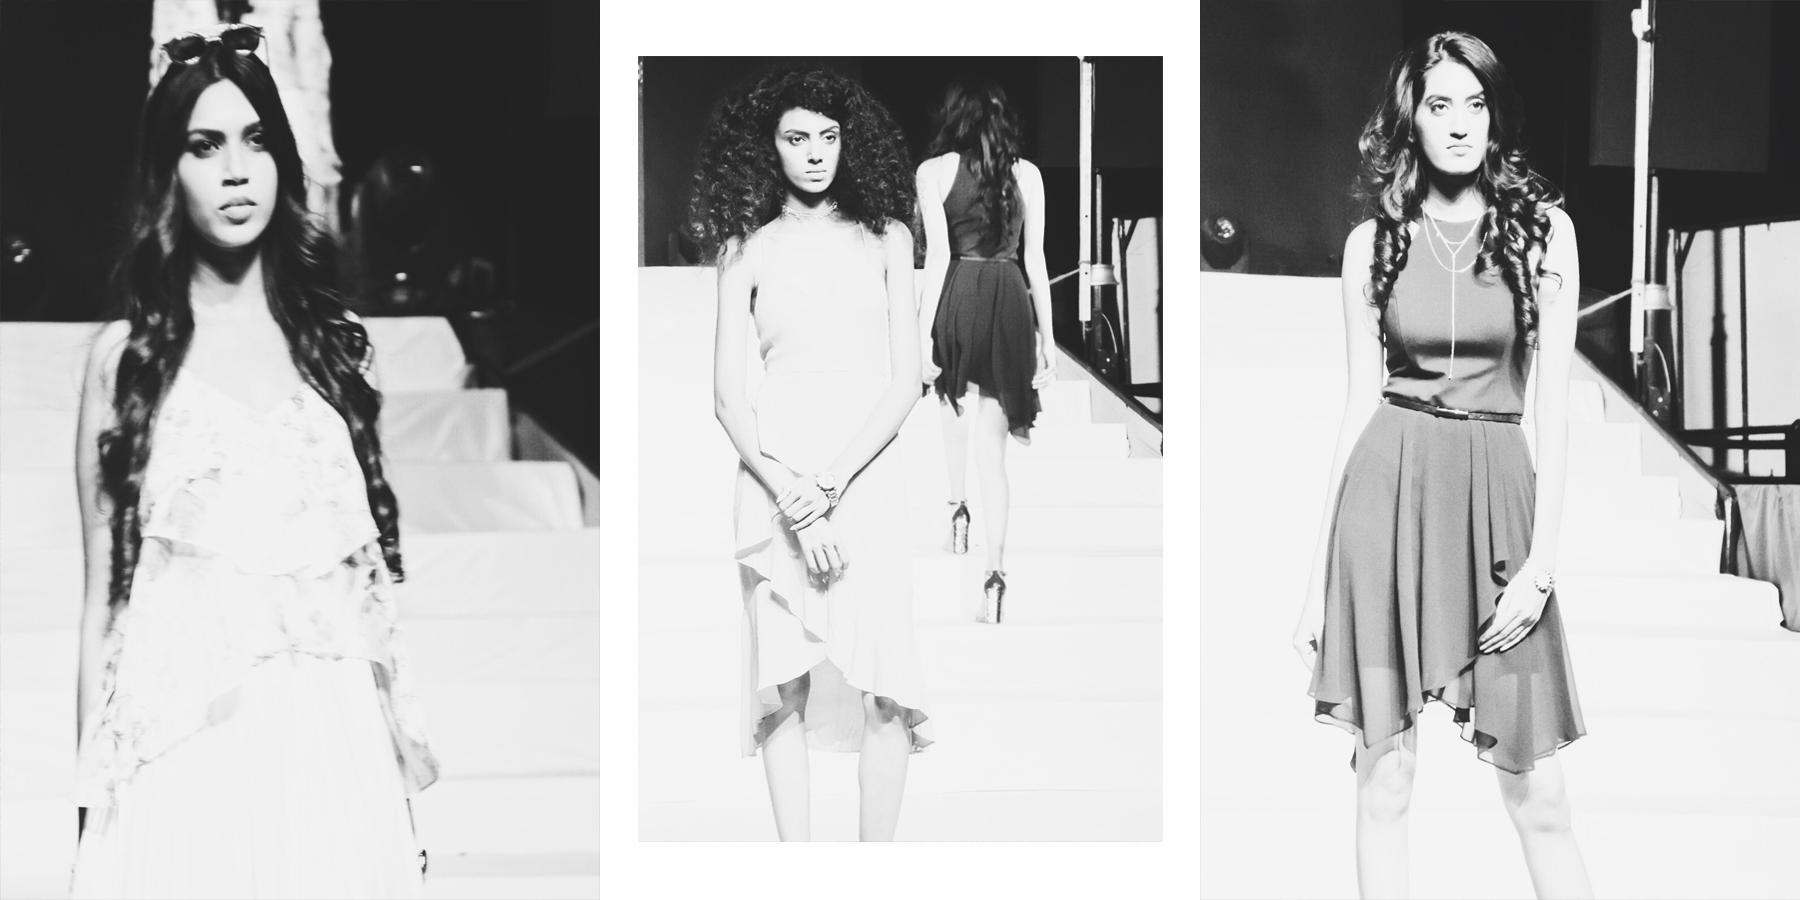 Beautiful models on the catwalk